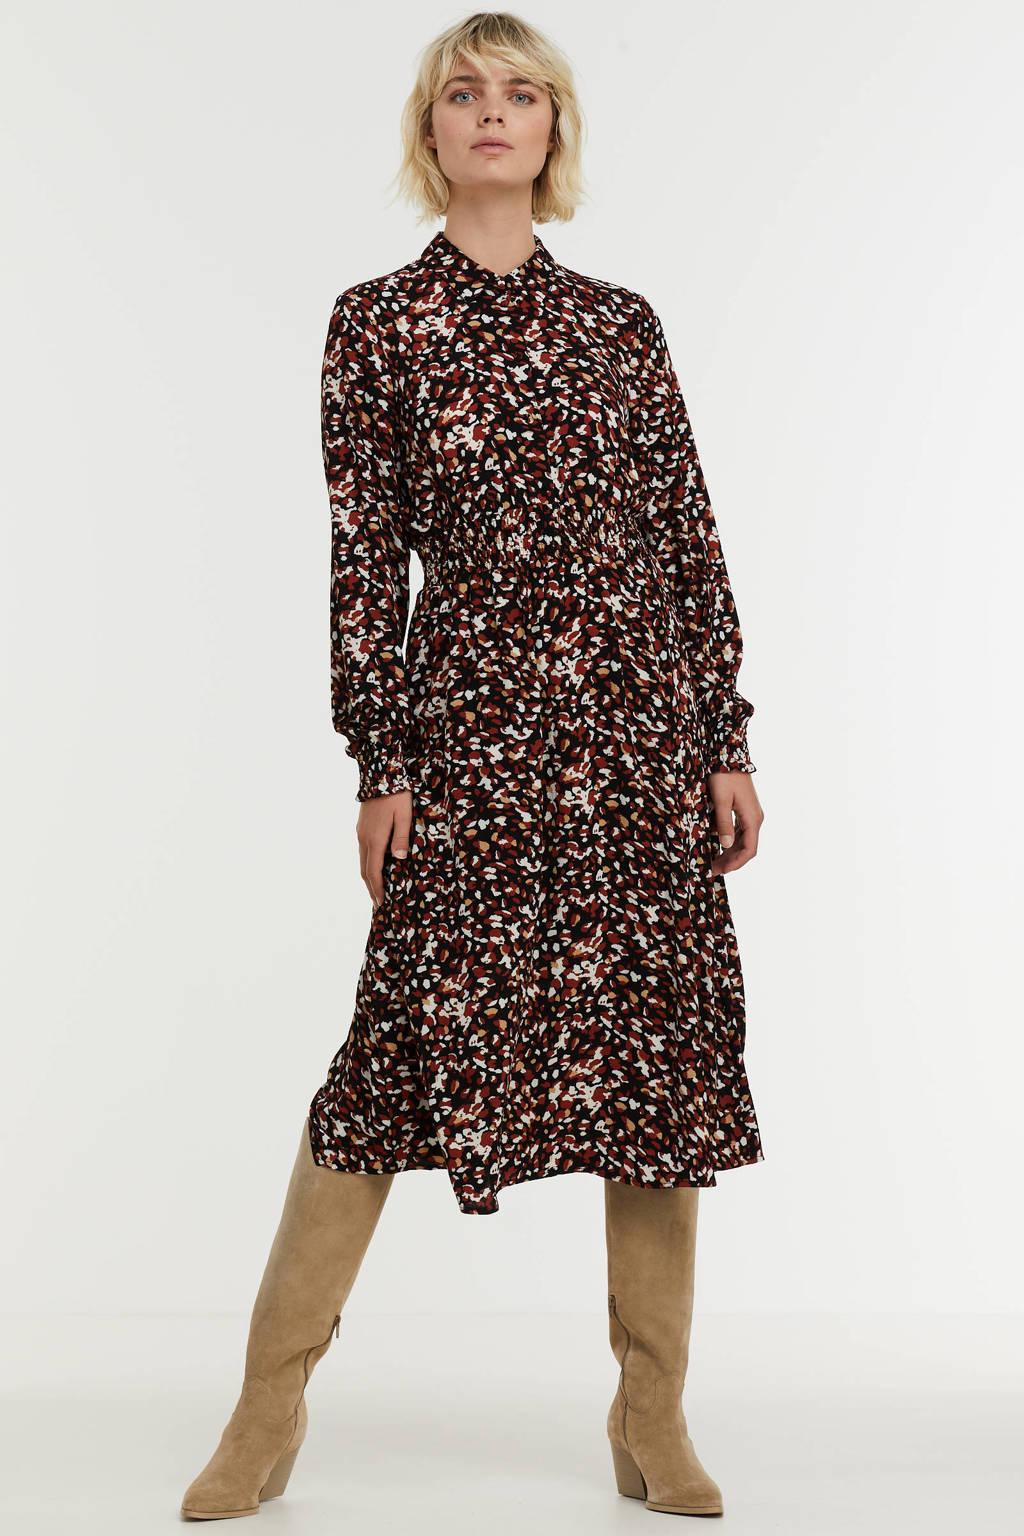 VERO MODA jurk VMSAGA van gerecycled polyester zwart/rood/wit, Zwart/rood/wit